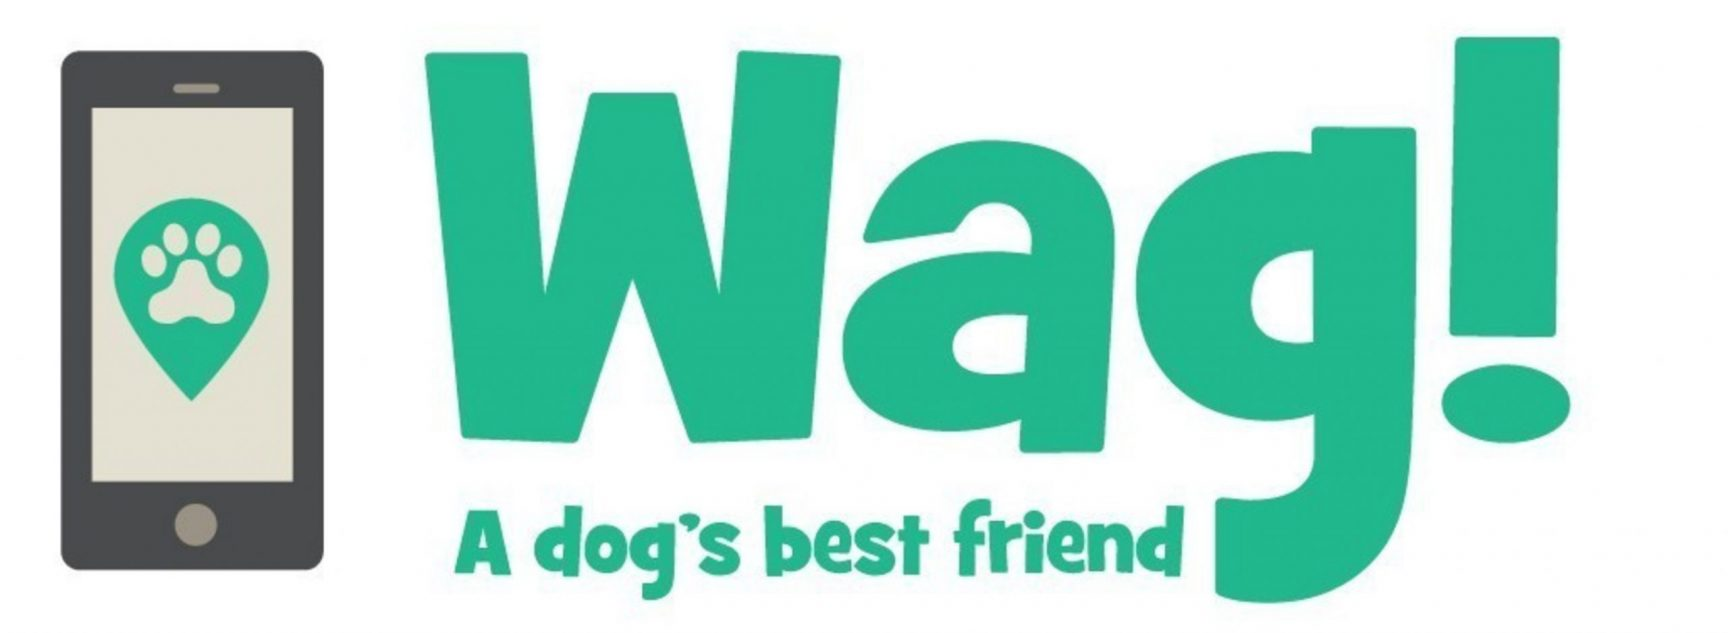 Wag, Pet Care, Dog Walking, Dog Sitting